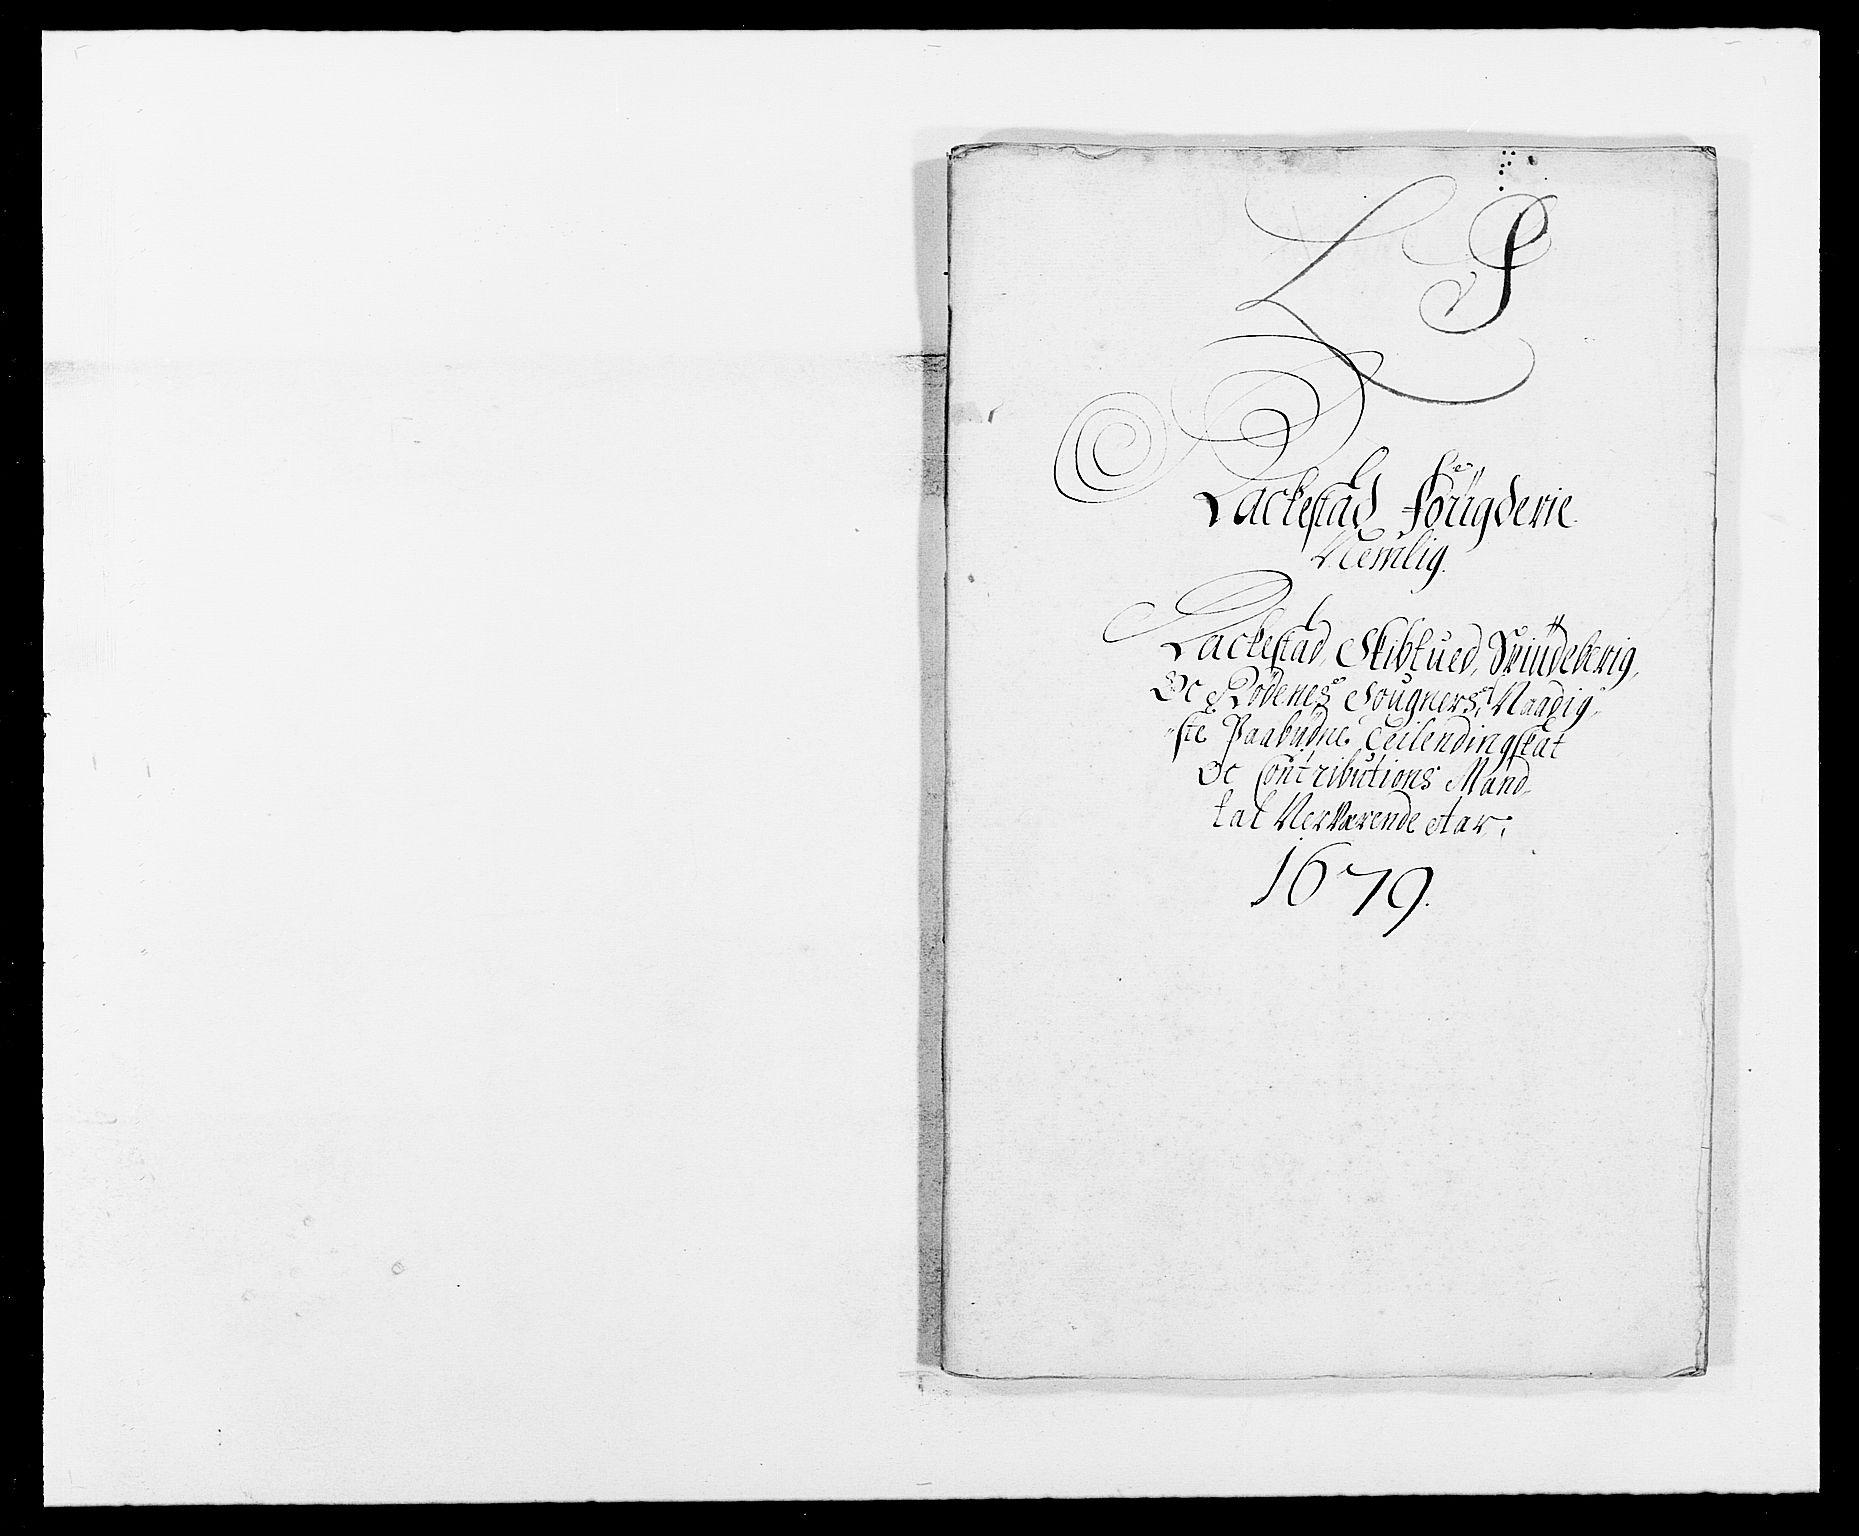 RA, Rentekammeret inntil 1814, Reviderte regnskaper, Fogderegnskap, R05/L0271: Fogderegnskap Rakkestad, 1678-1679, s. 305